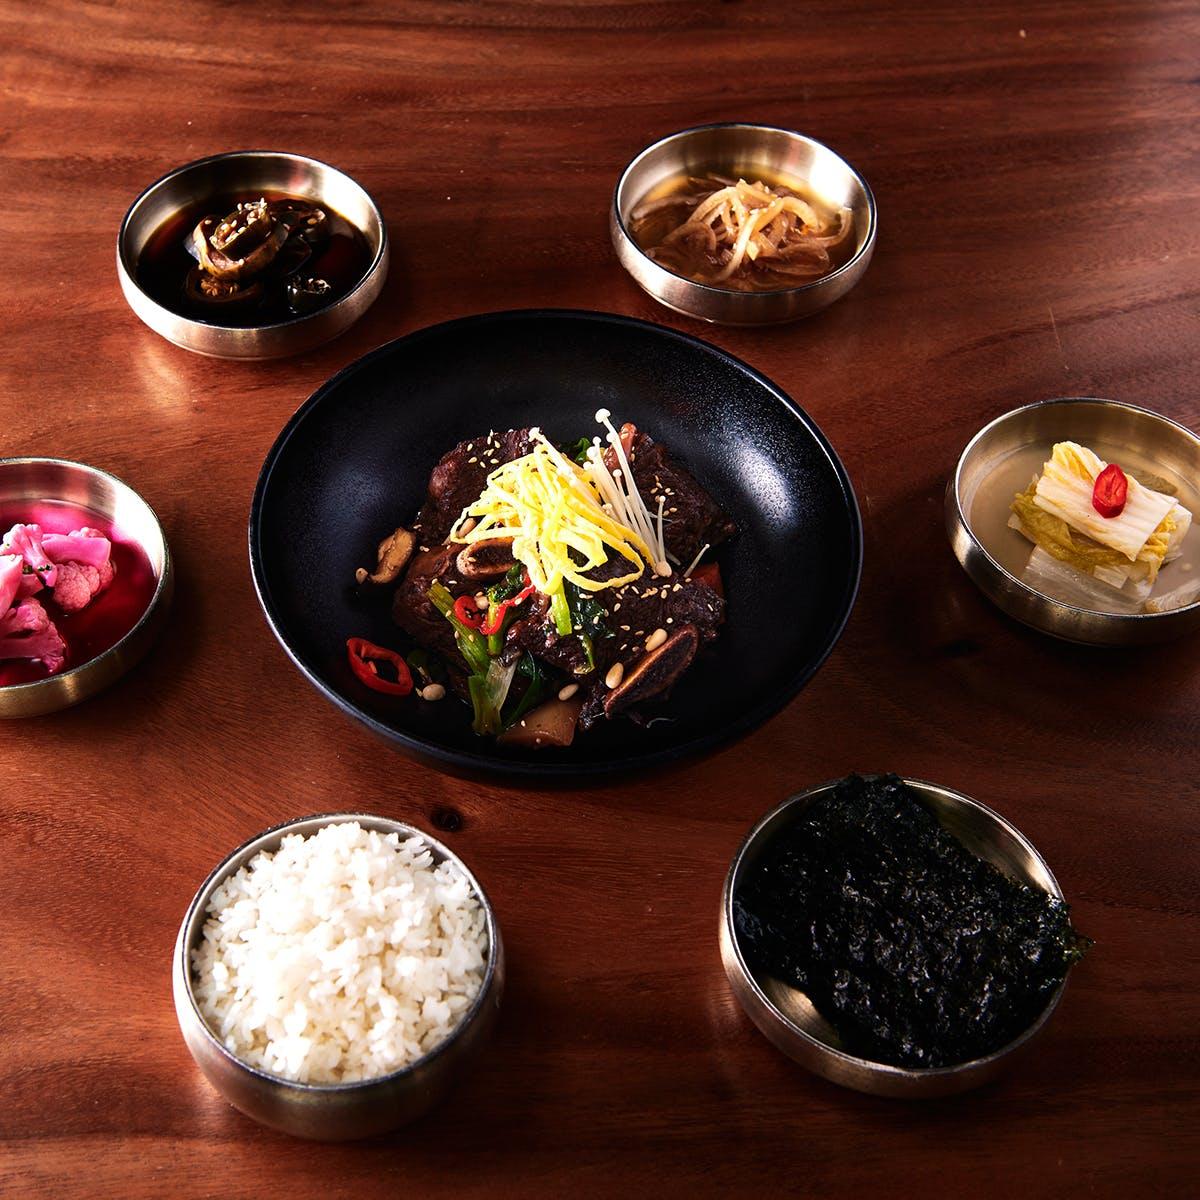 Samwon Garden Korean BBQ - Korean BBQ Galbi Jjim Kit for 6